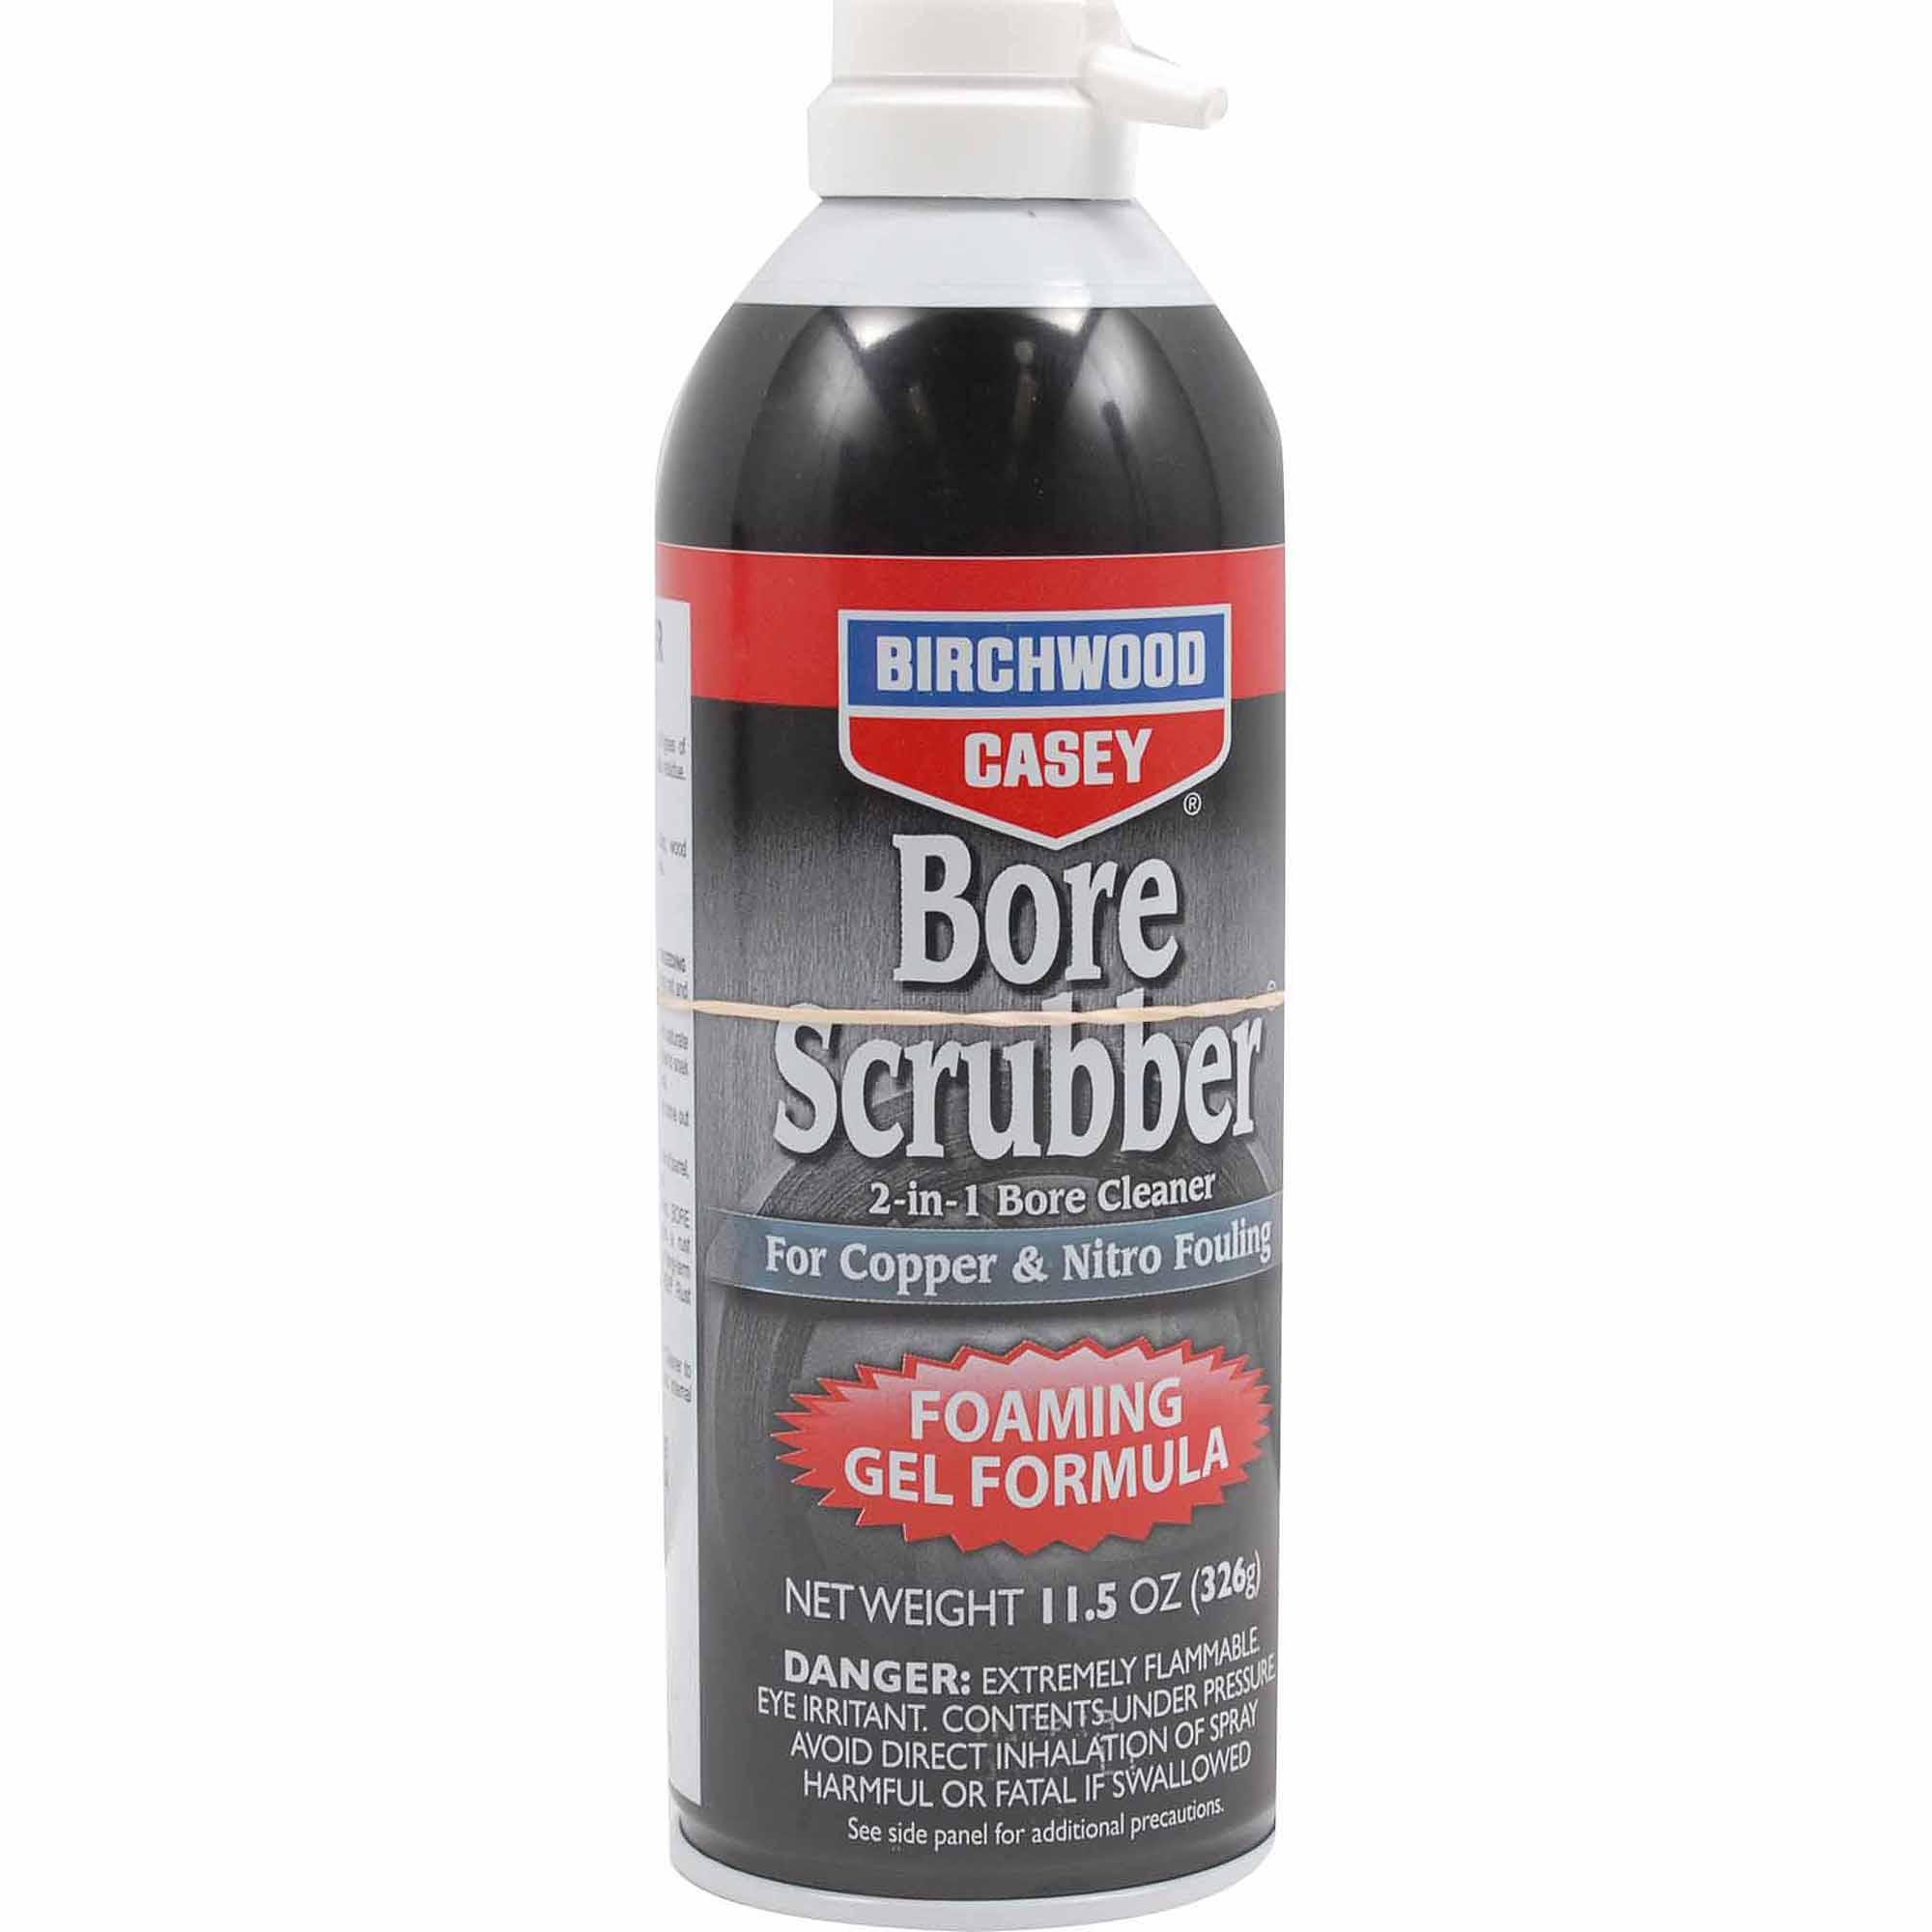 Birchwood Casey Bore Scrubber Foaming Gel, 11.5 oz